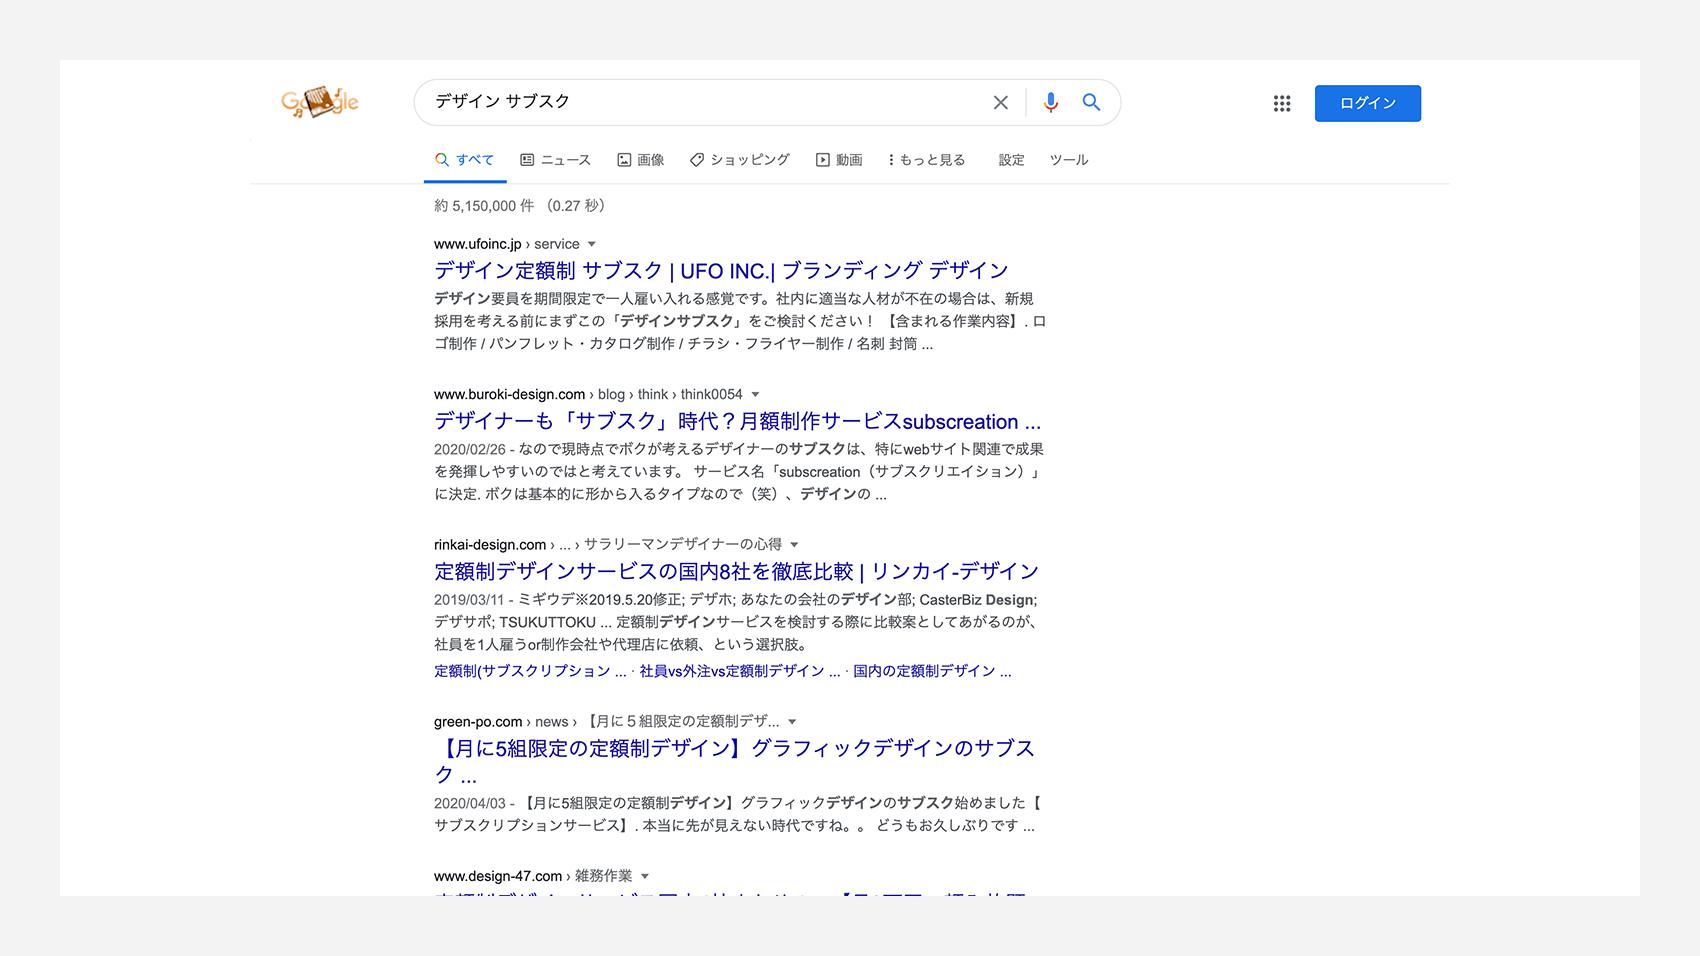 Googleの検索結果ページ画面